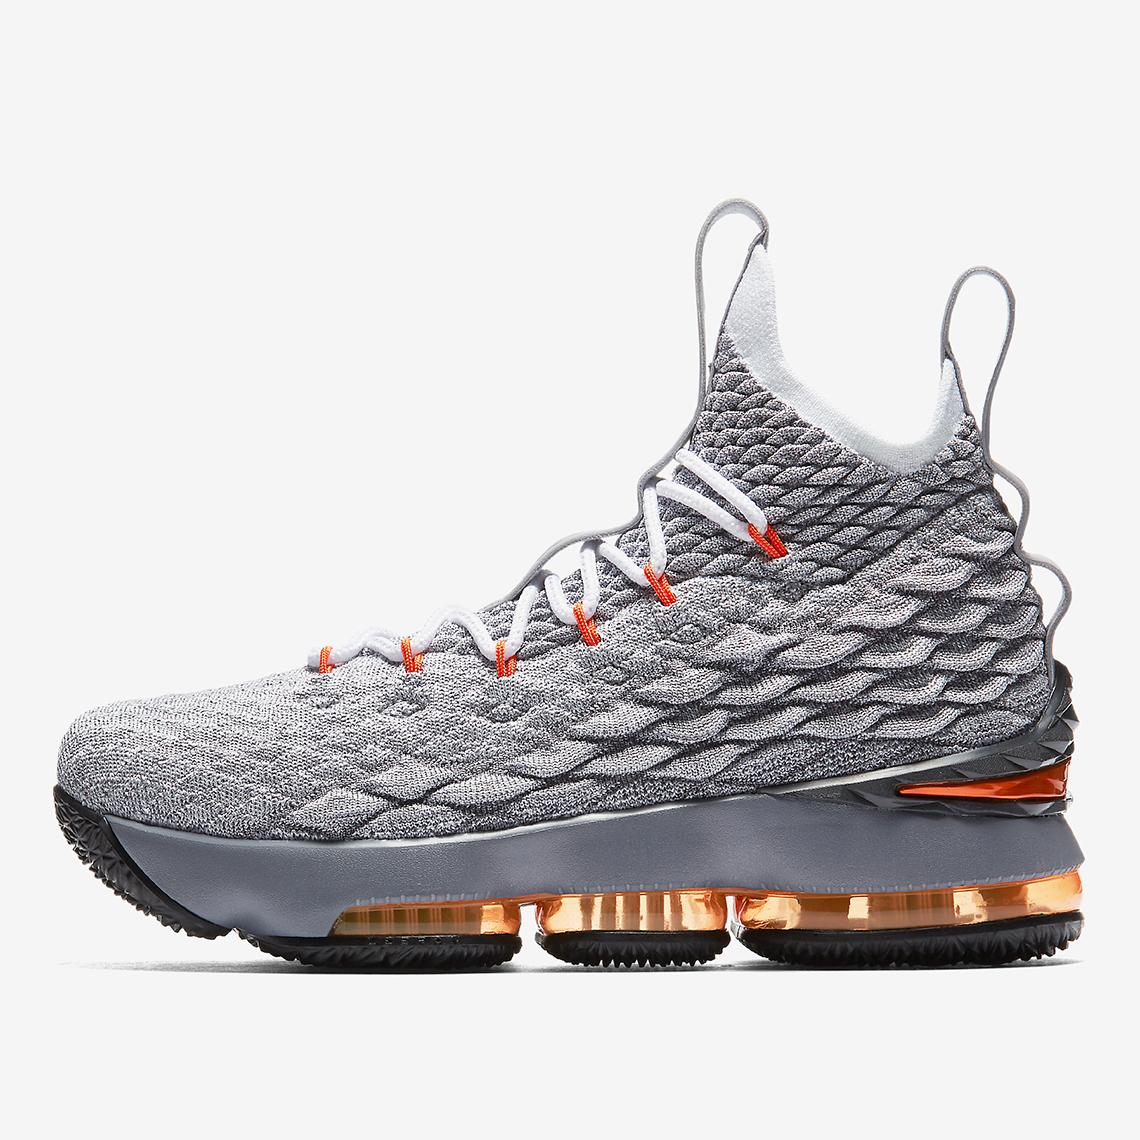 new product 992ea 2d10b Nike LeBron 15